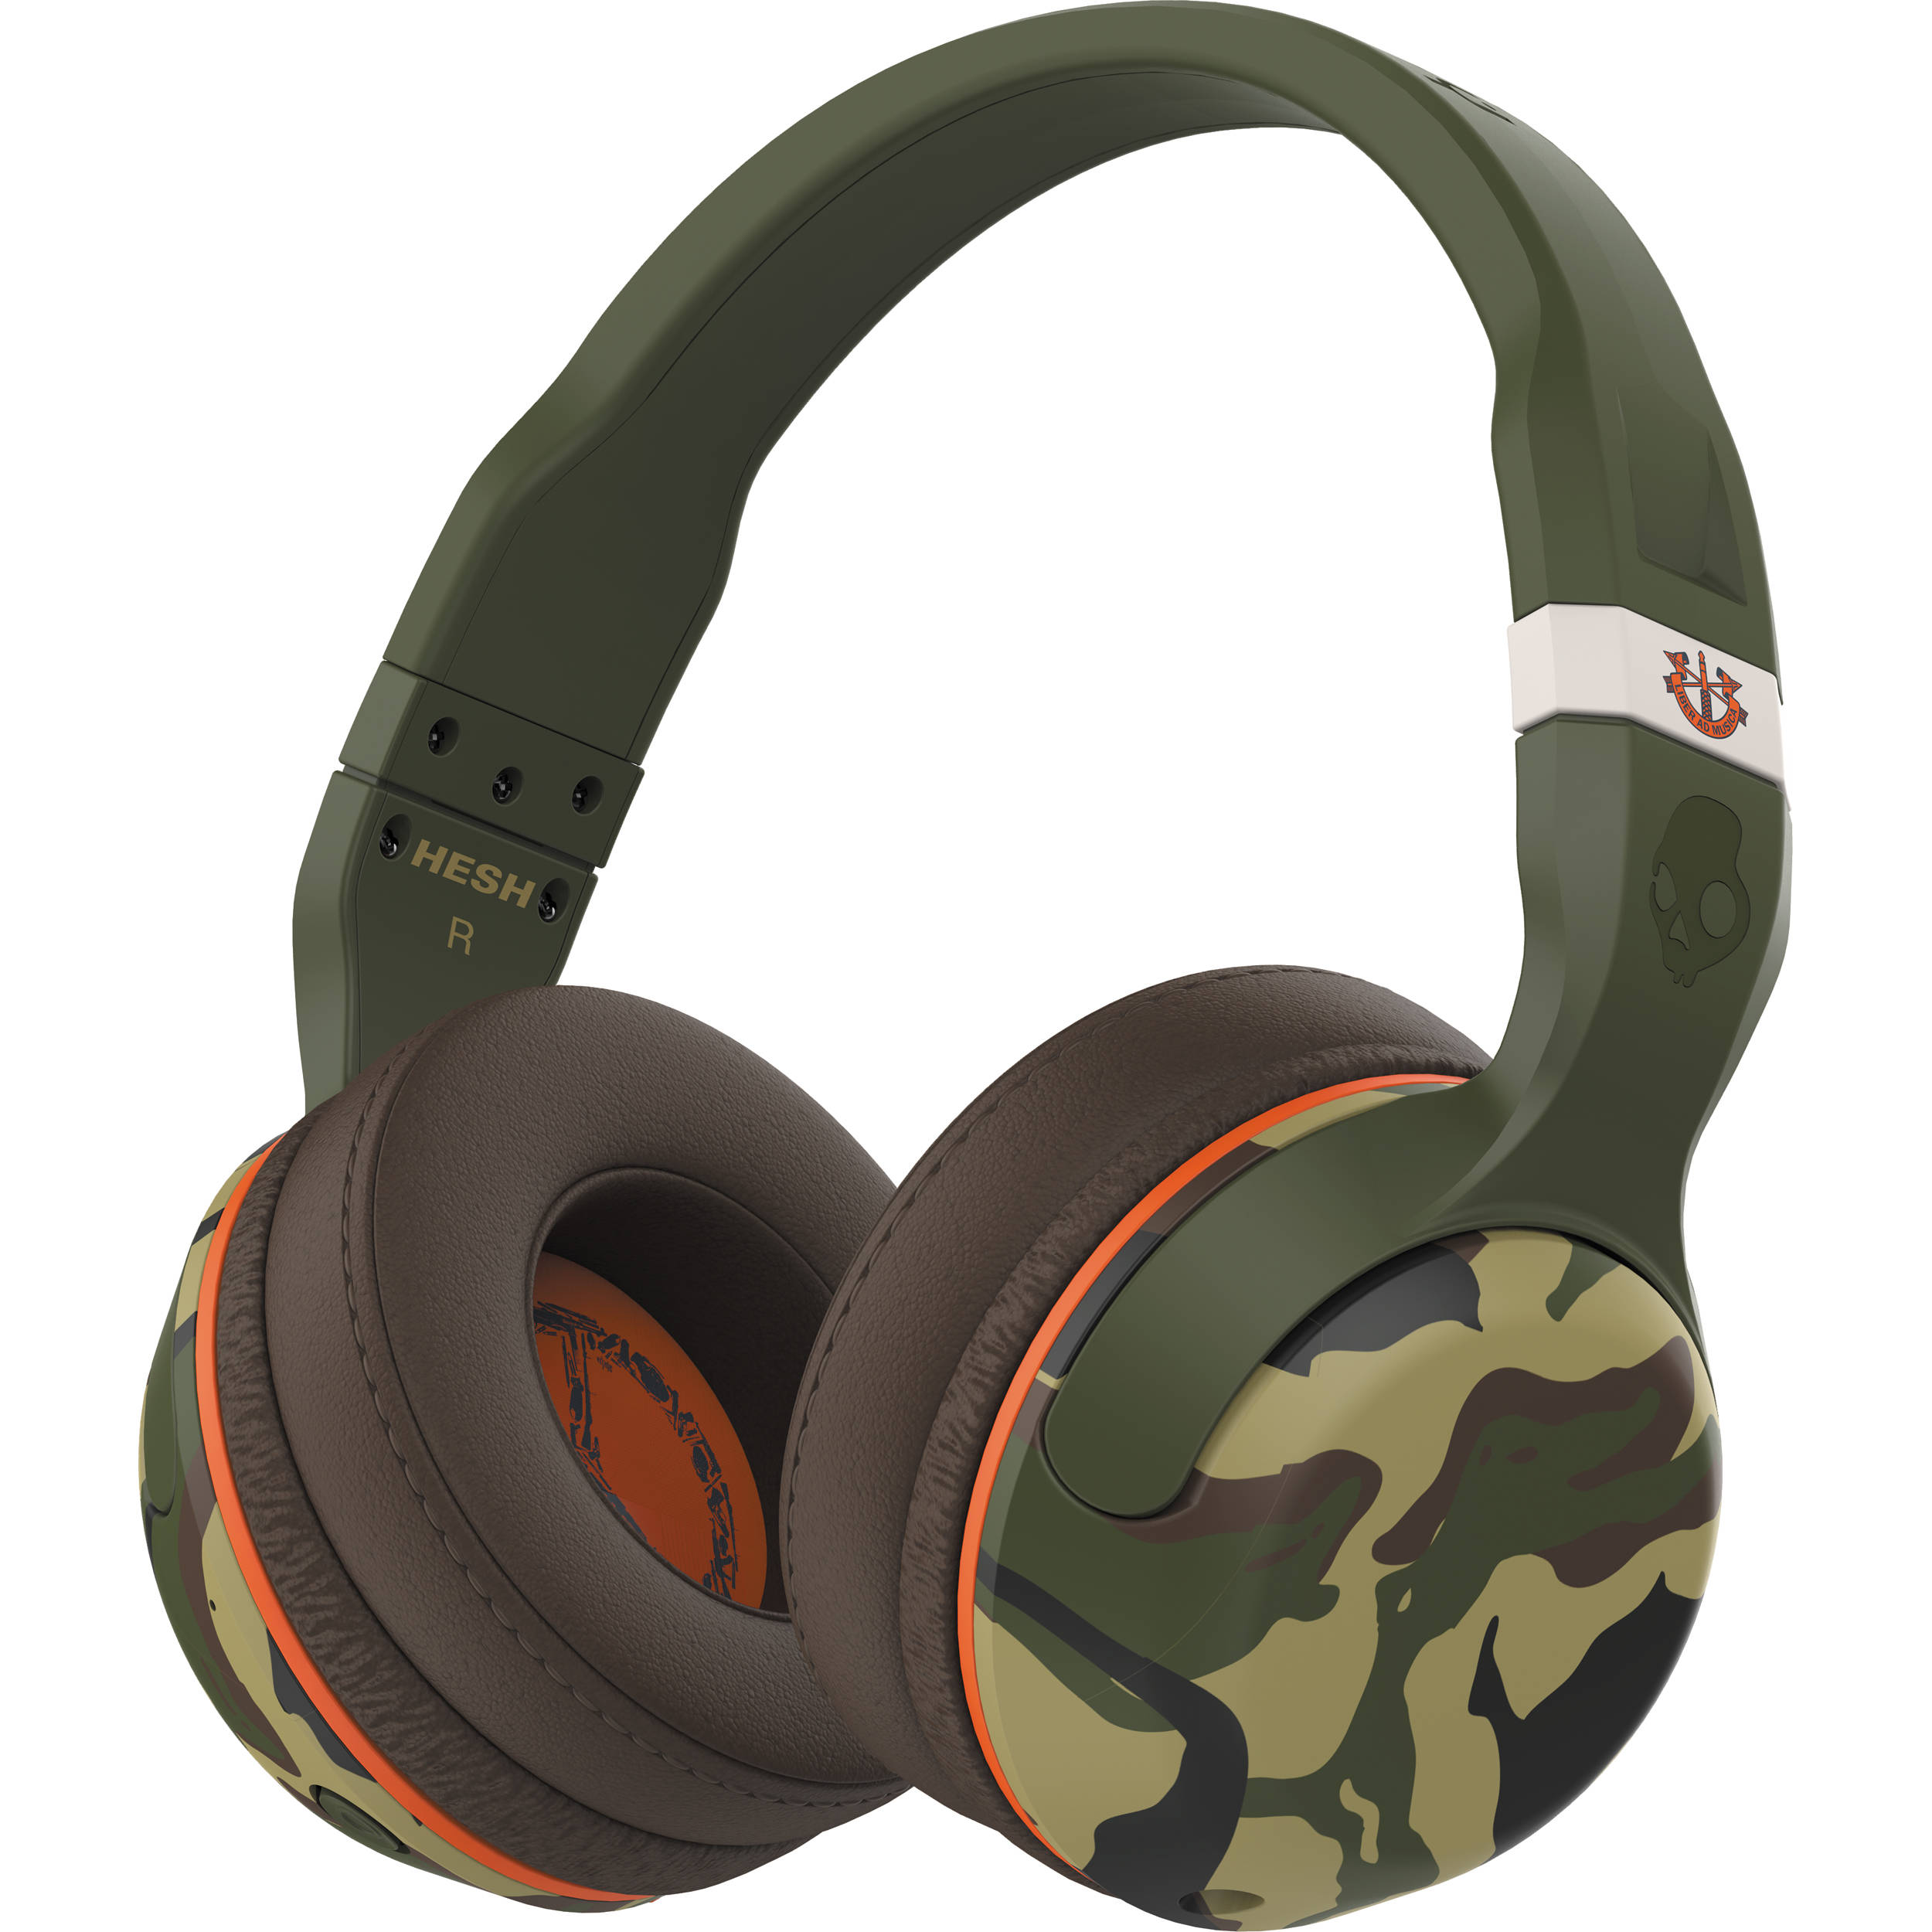 Skullcandy Hesh 2 Wireless Bluetooth Headphones (Camo)